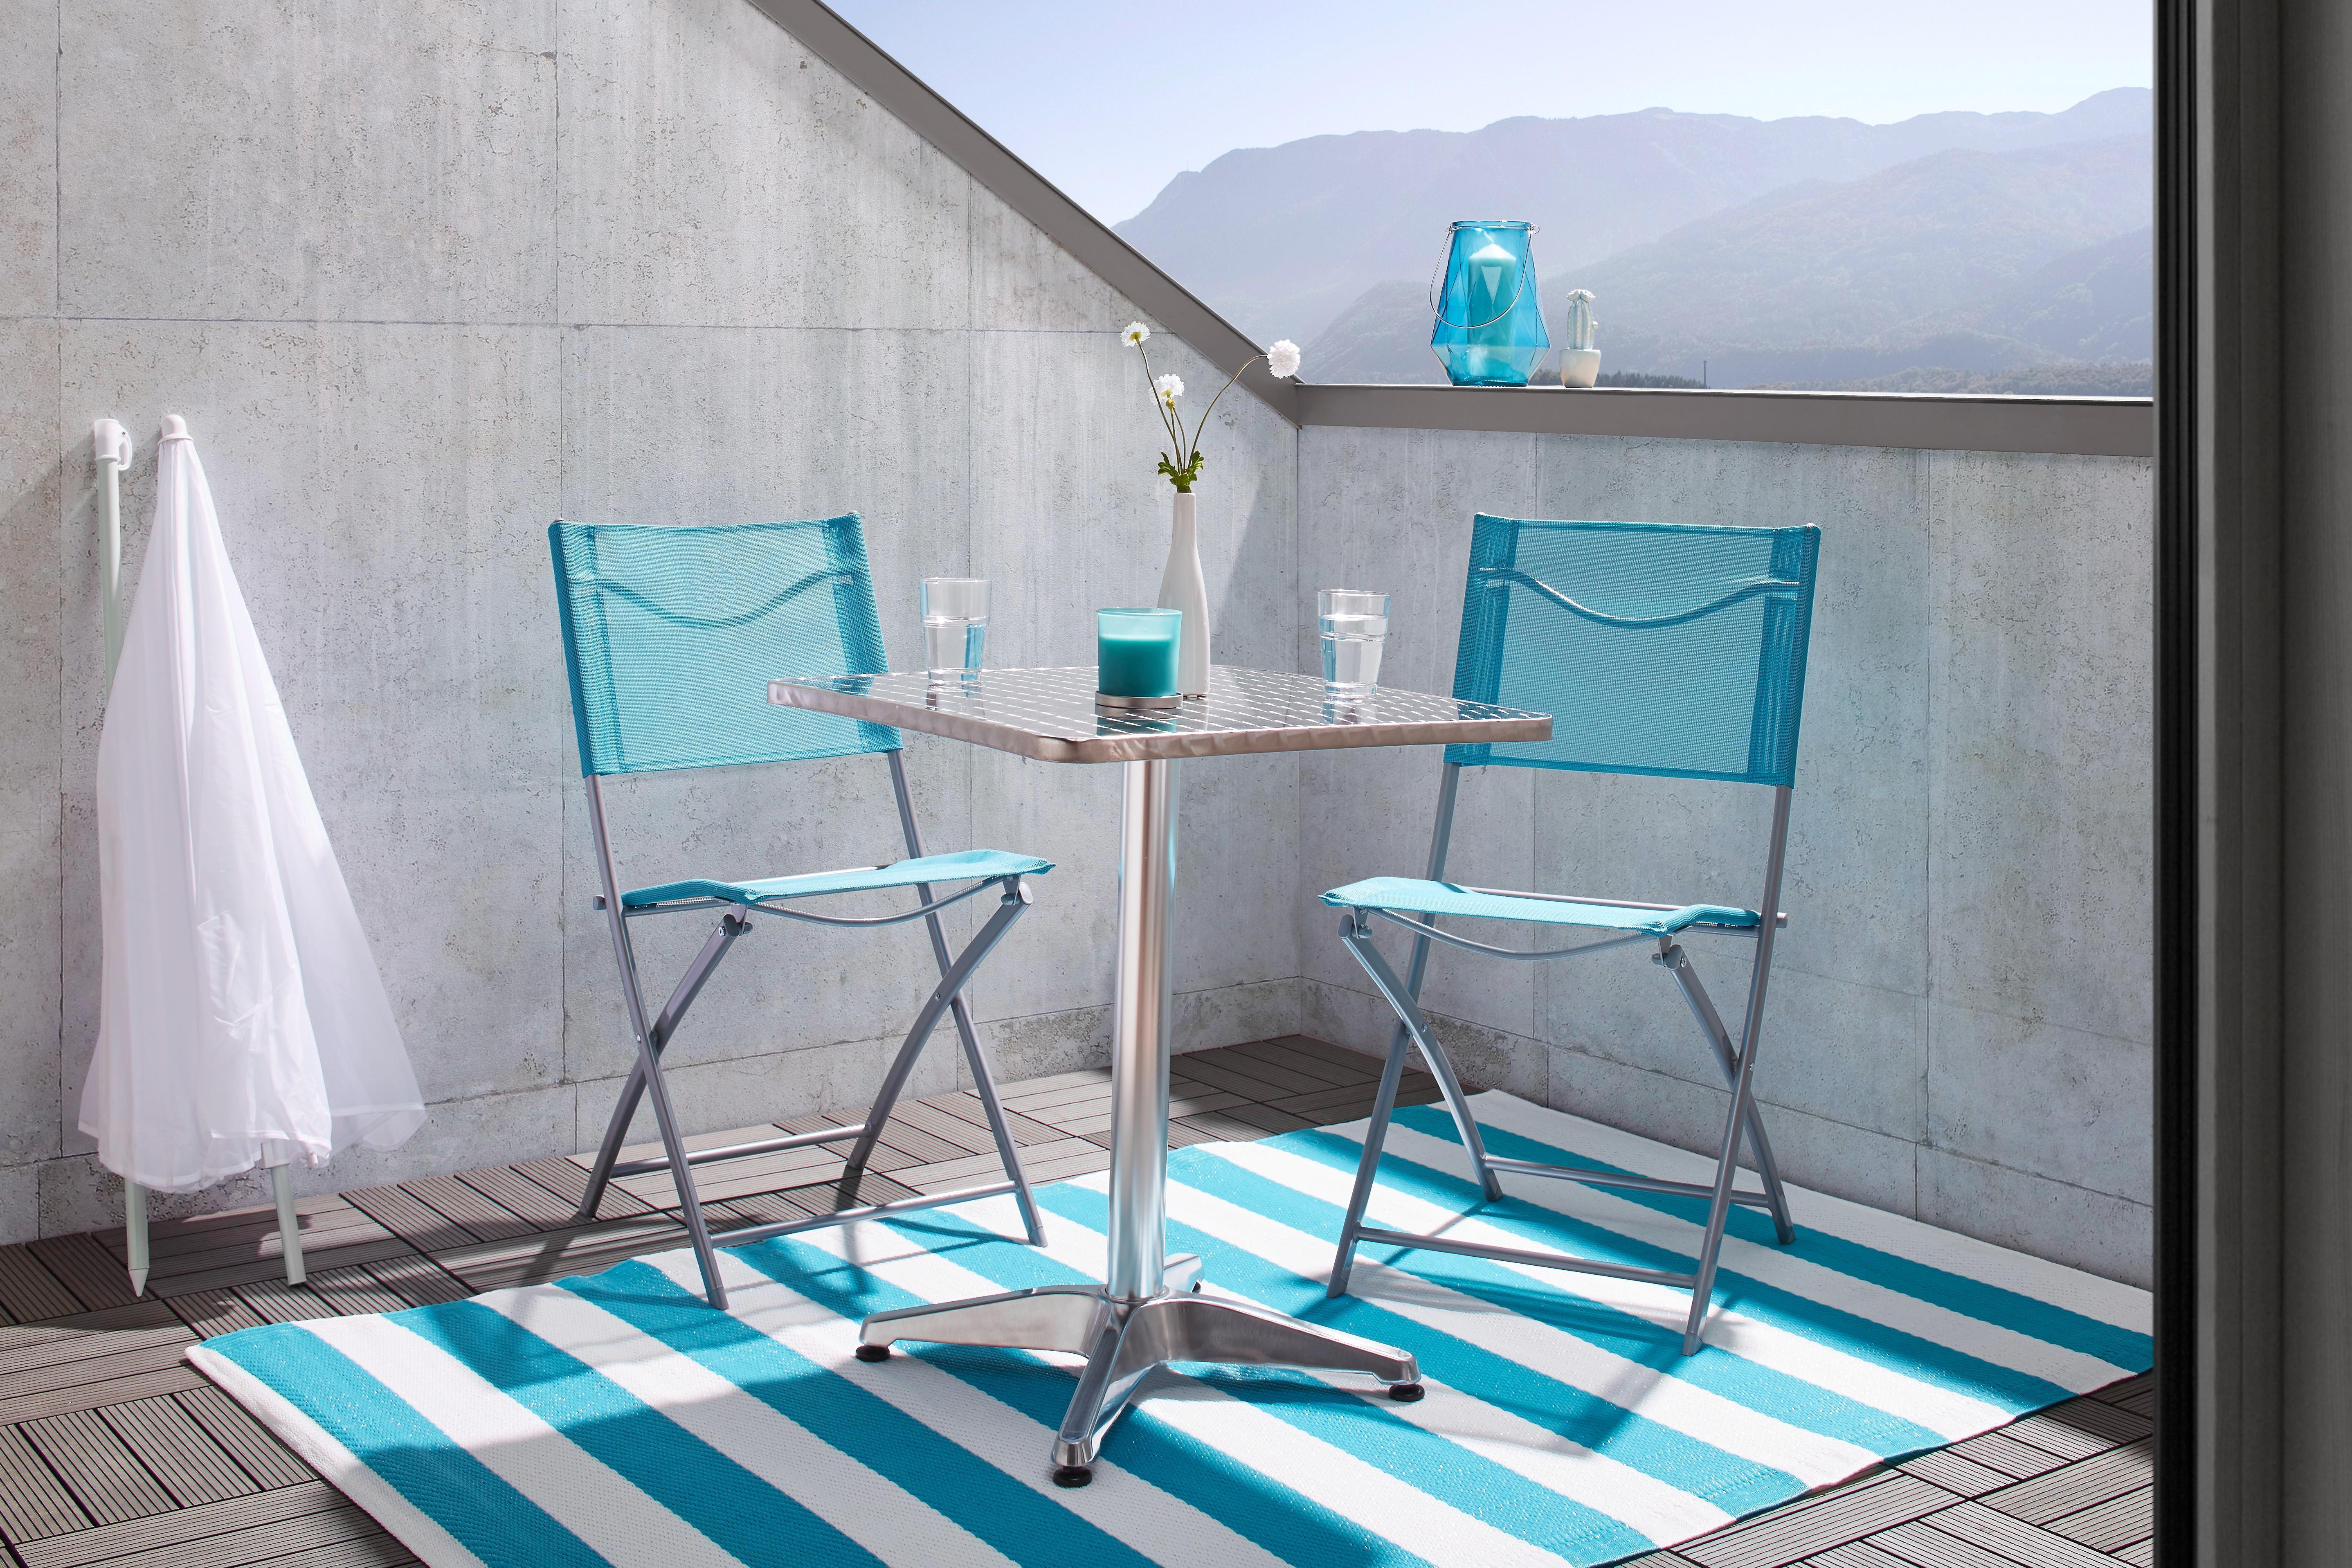 Gartenstuhl Rüdiger in Blau - Blau/Chromfarben, Kunststoff/Textil (43/83/53cm) - MÖMAX modern living